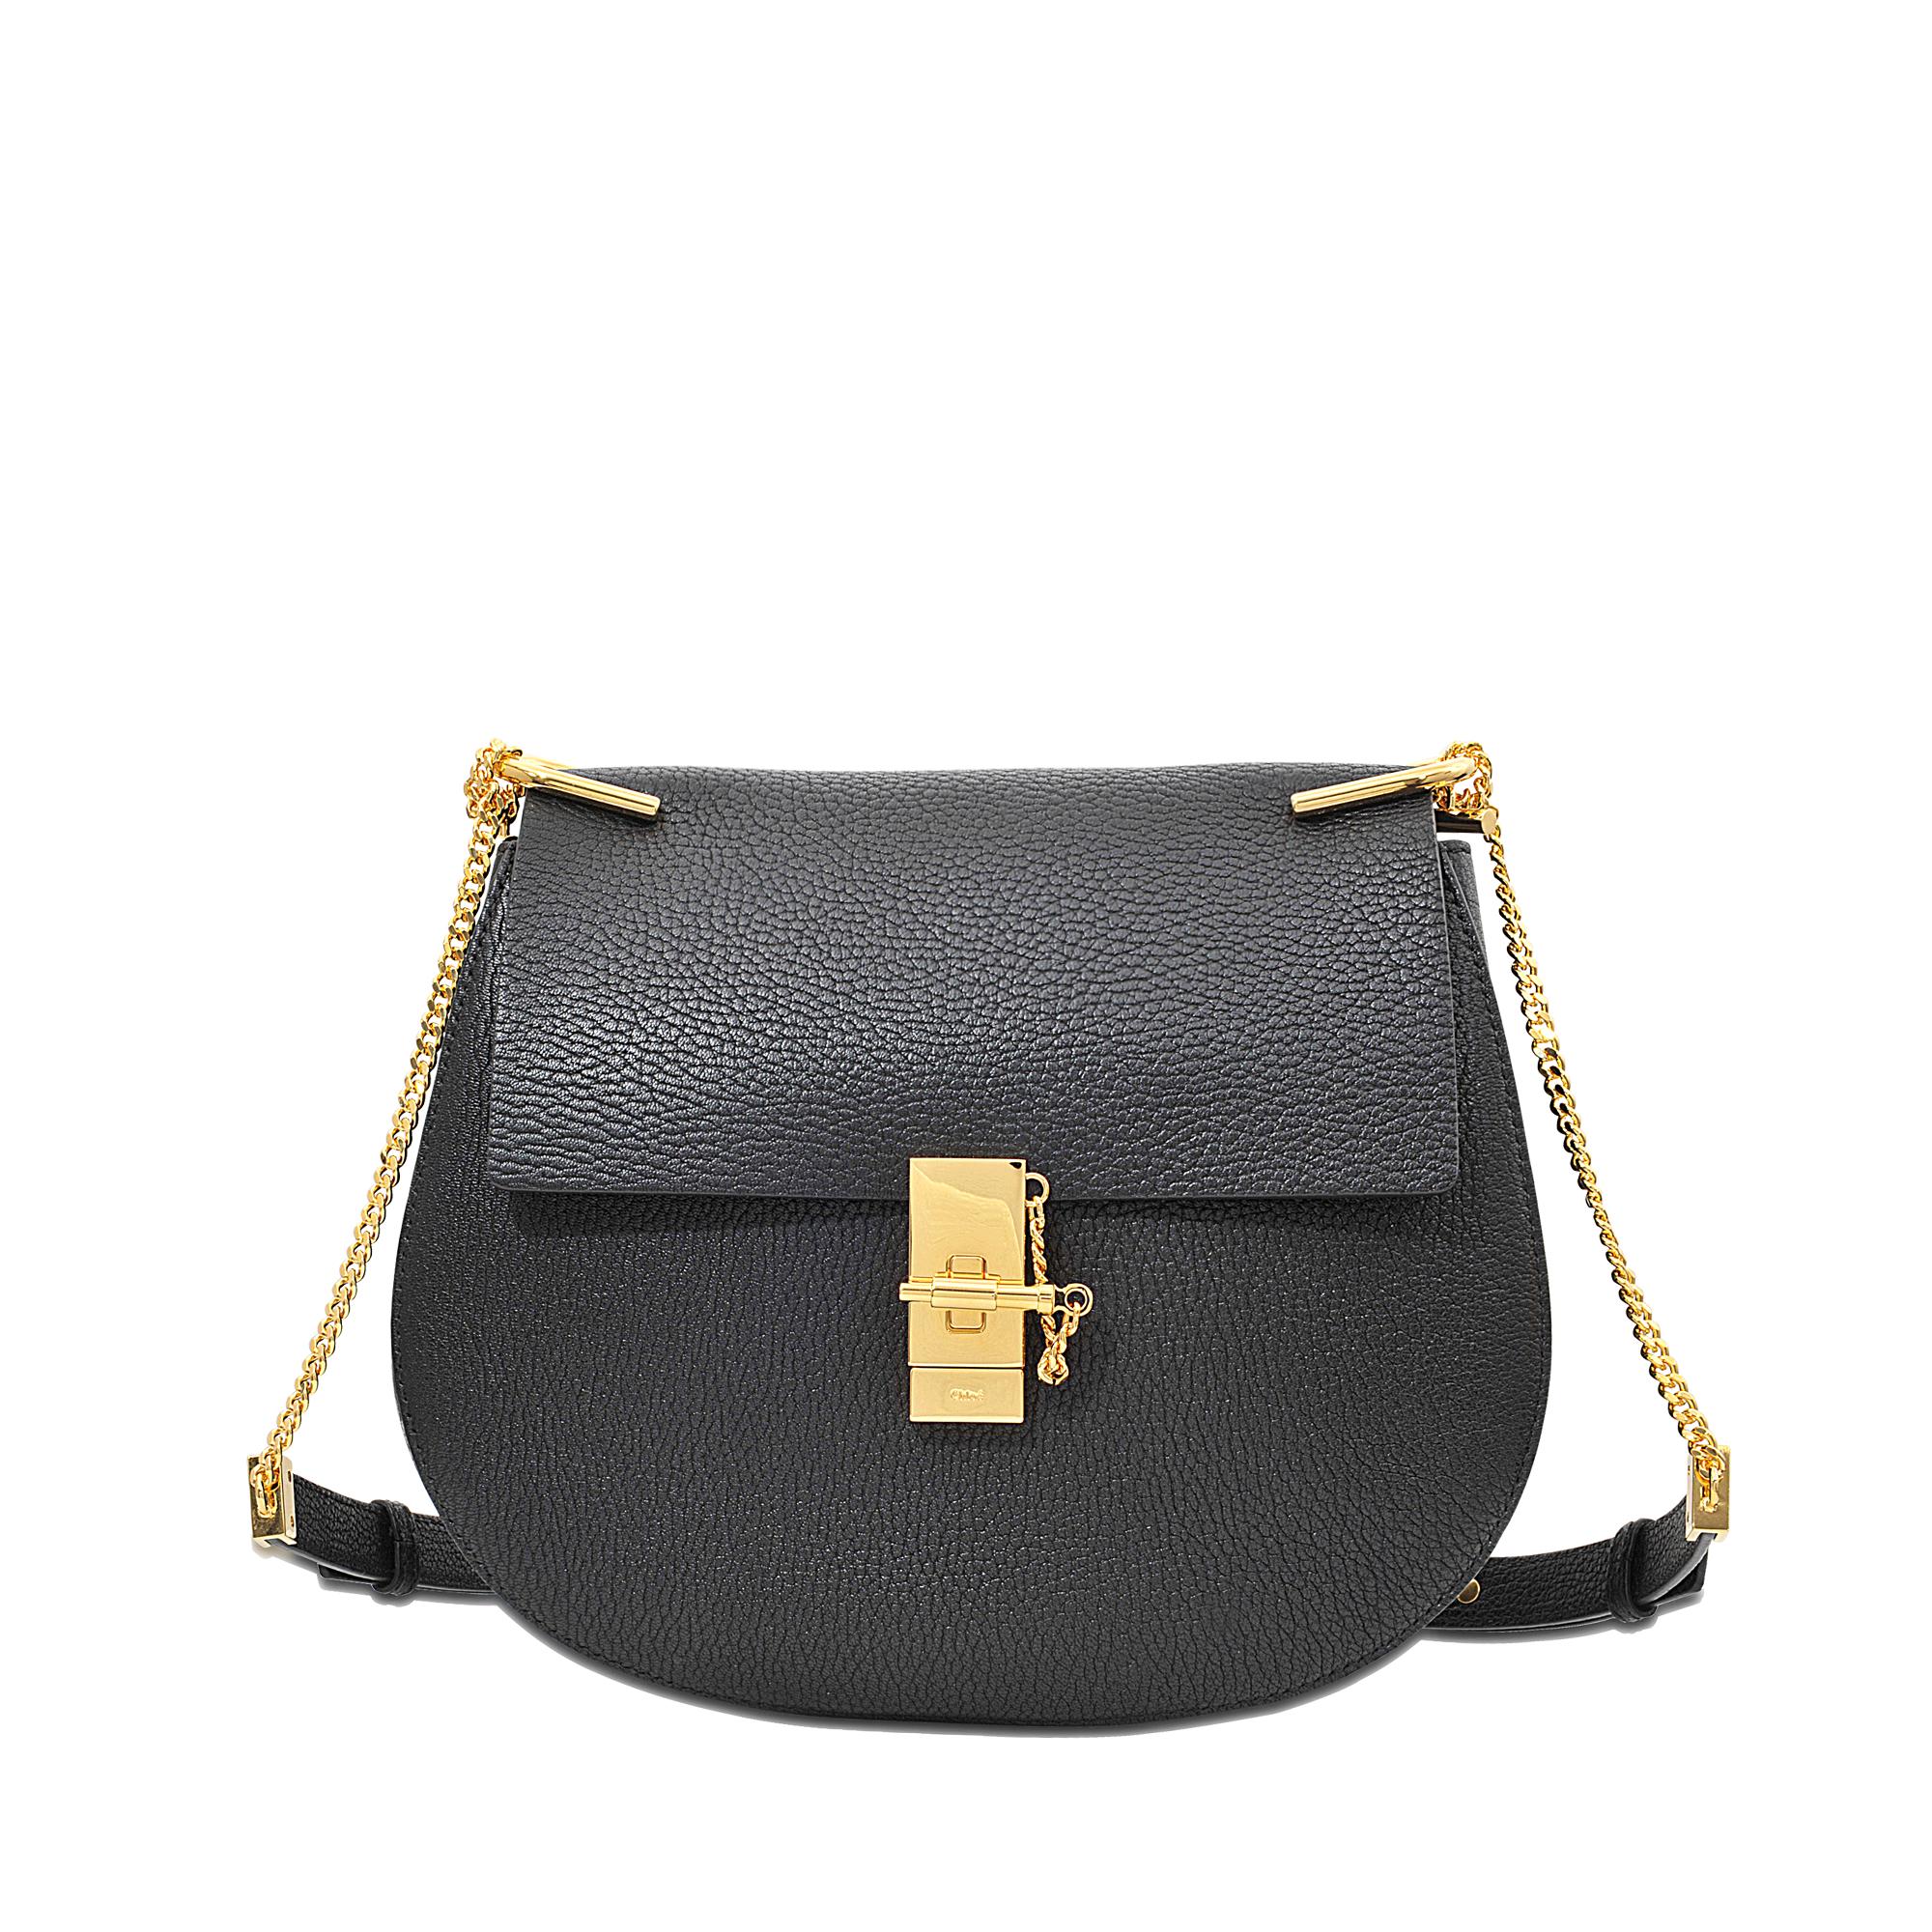 chloe drew medium saddle bag chloe purses. Black Bedroom Furniture Sets. Home Design Ideas